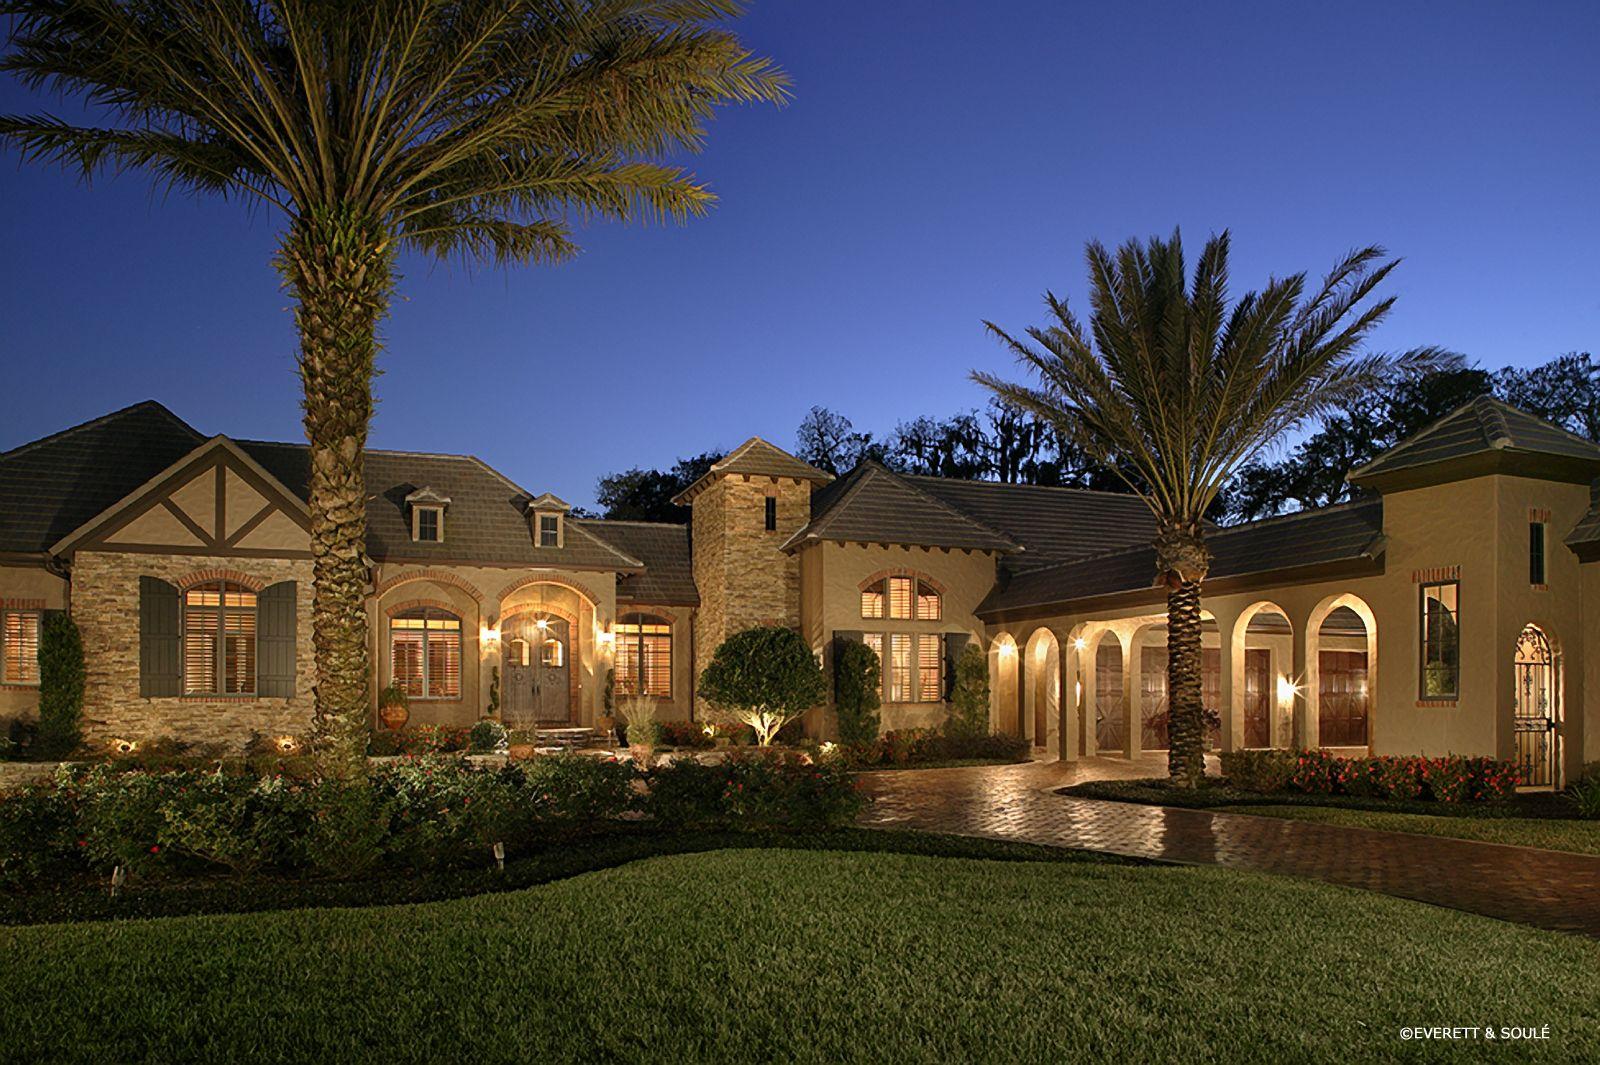 Disney Golden Oak Homes Αναζήτηση Google Exterior